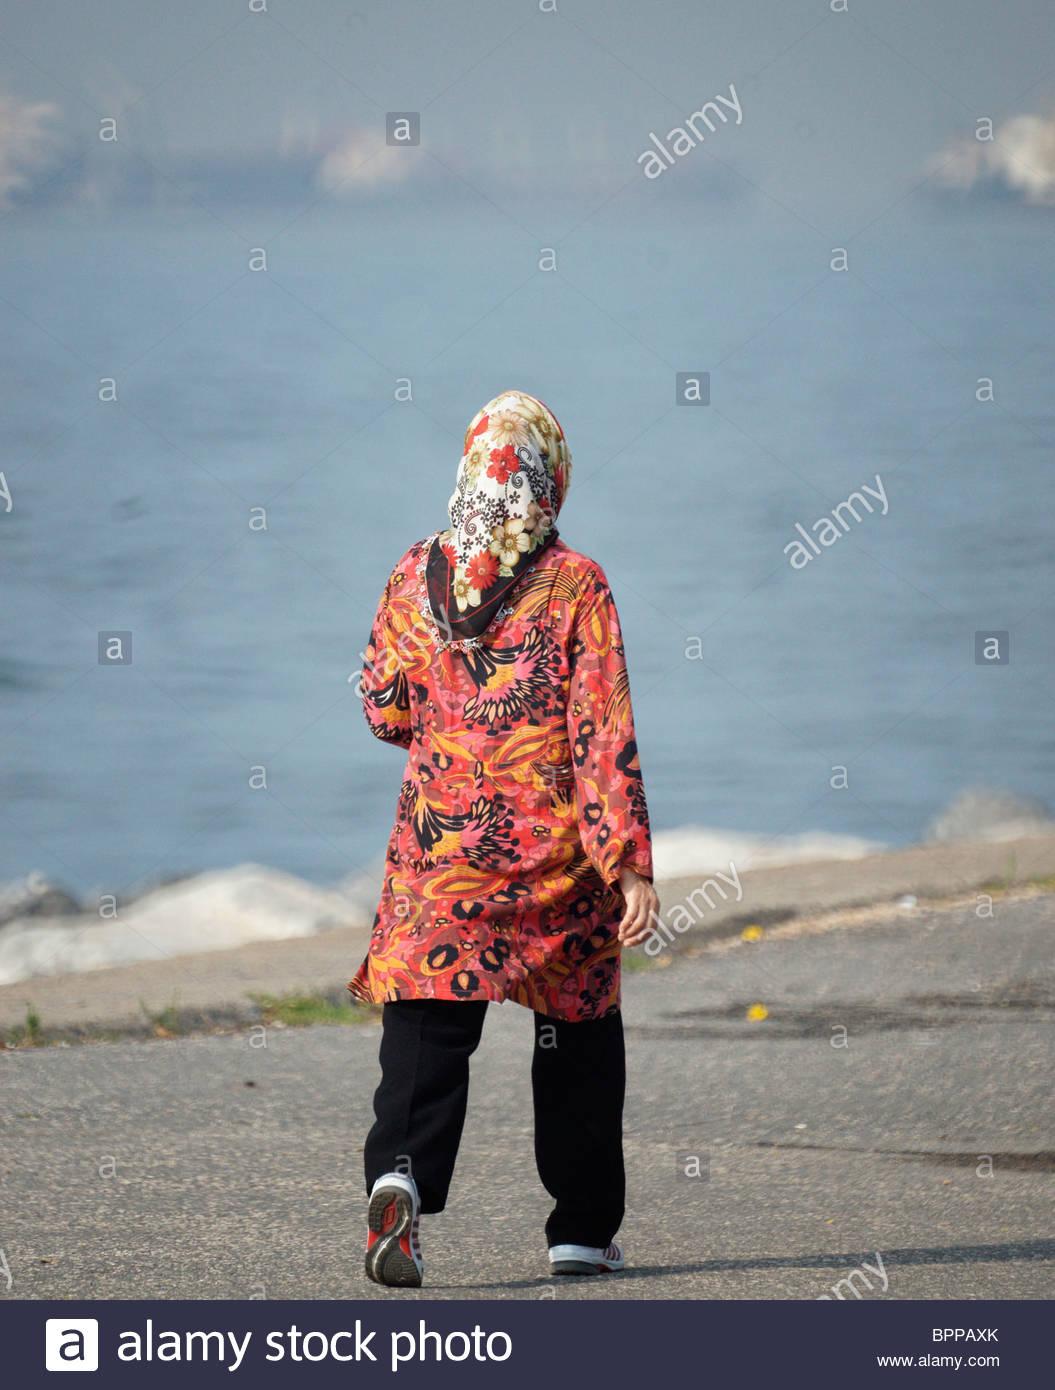 turkish-woman-wearing-headscarf-walking-